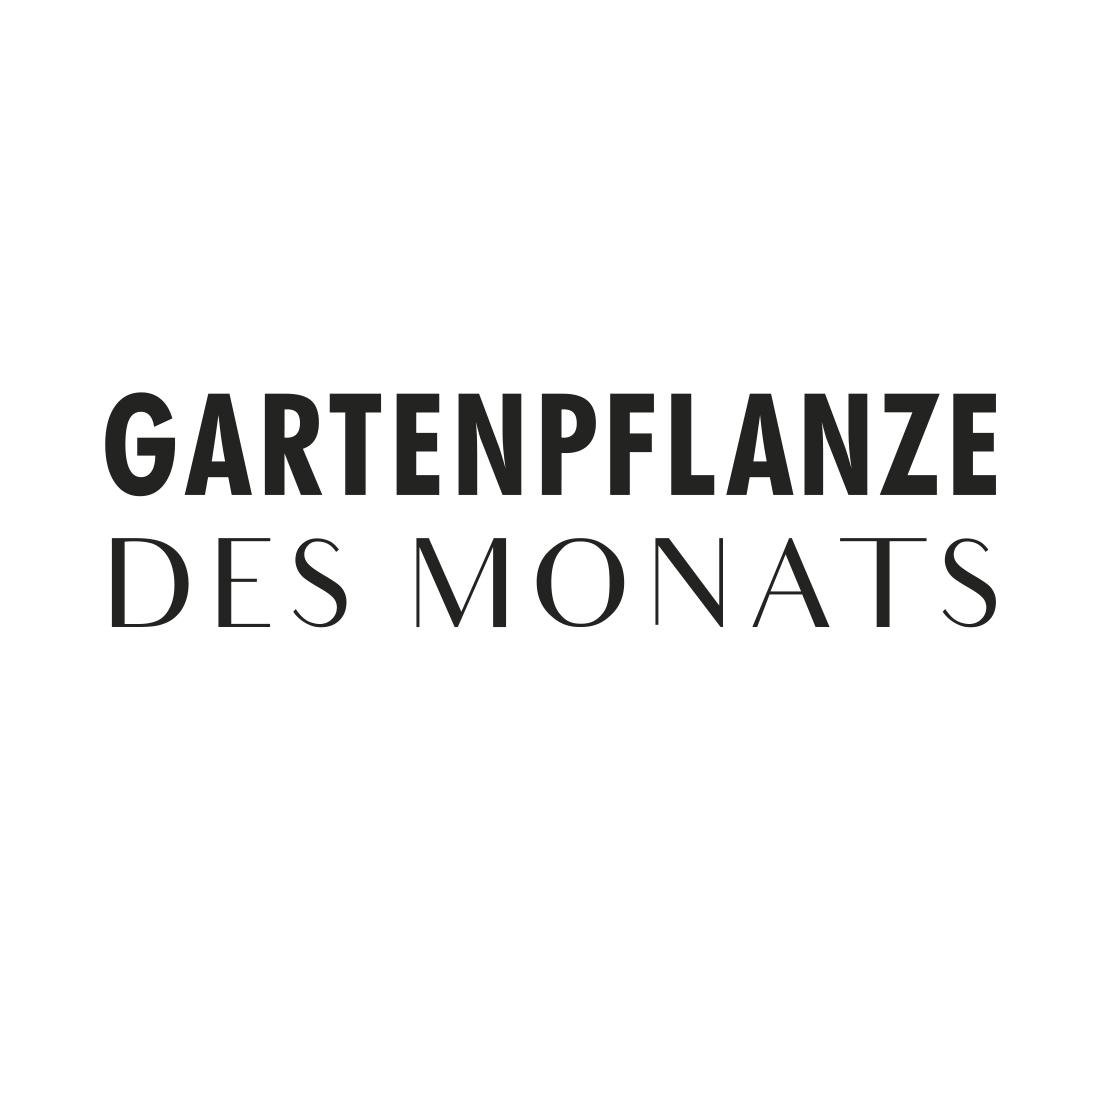 Gartenpflanze des Monats 2019